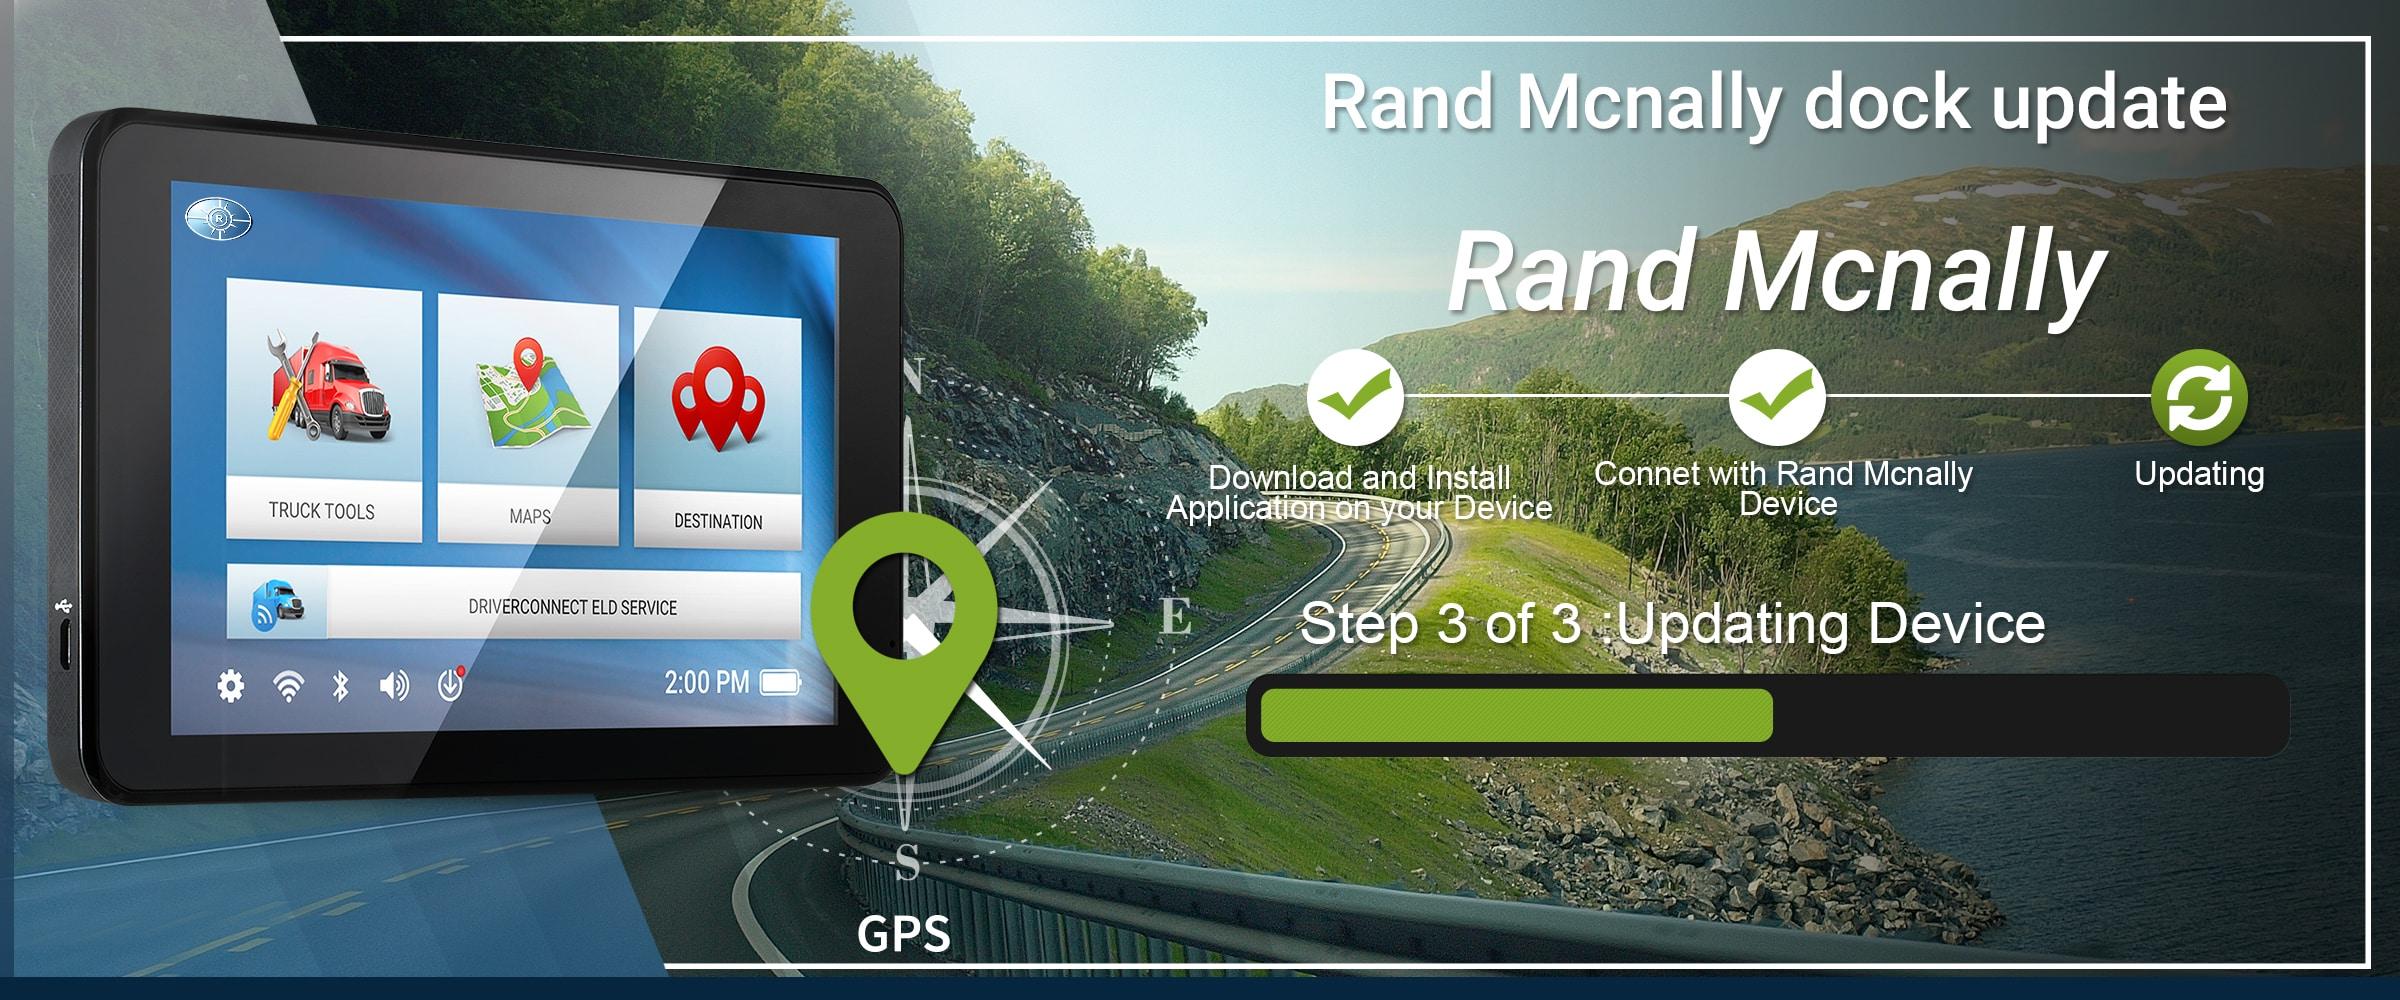 Rand Mcnally Dock Update | Rand McNally Update